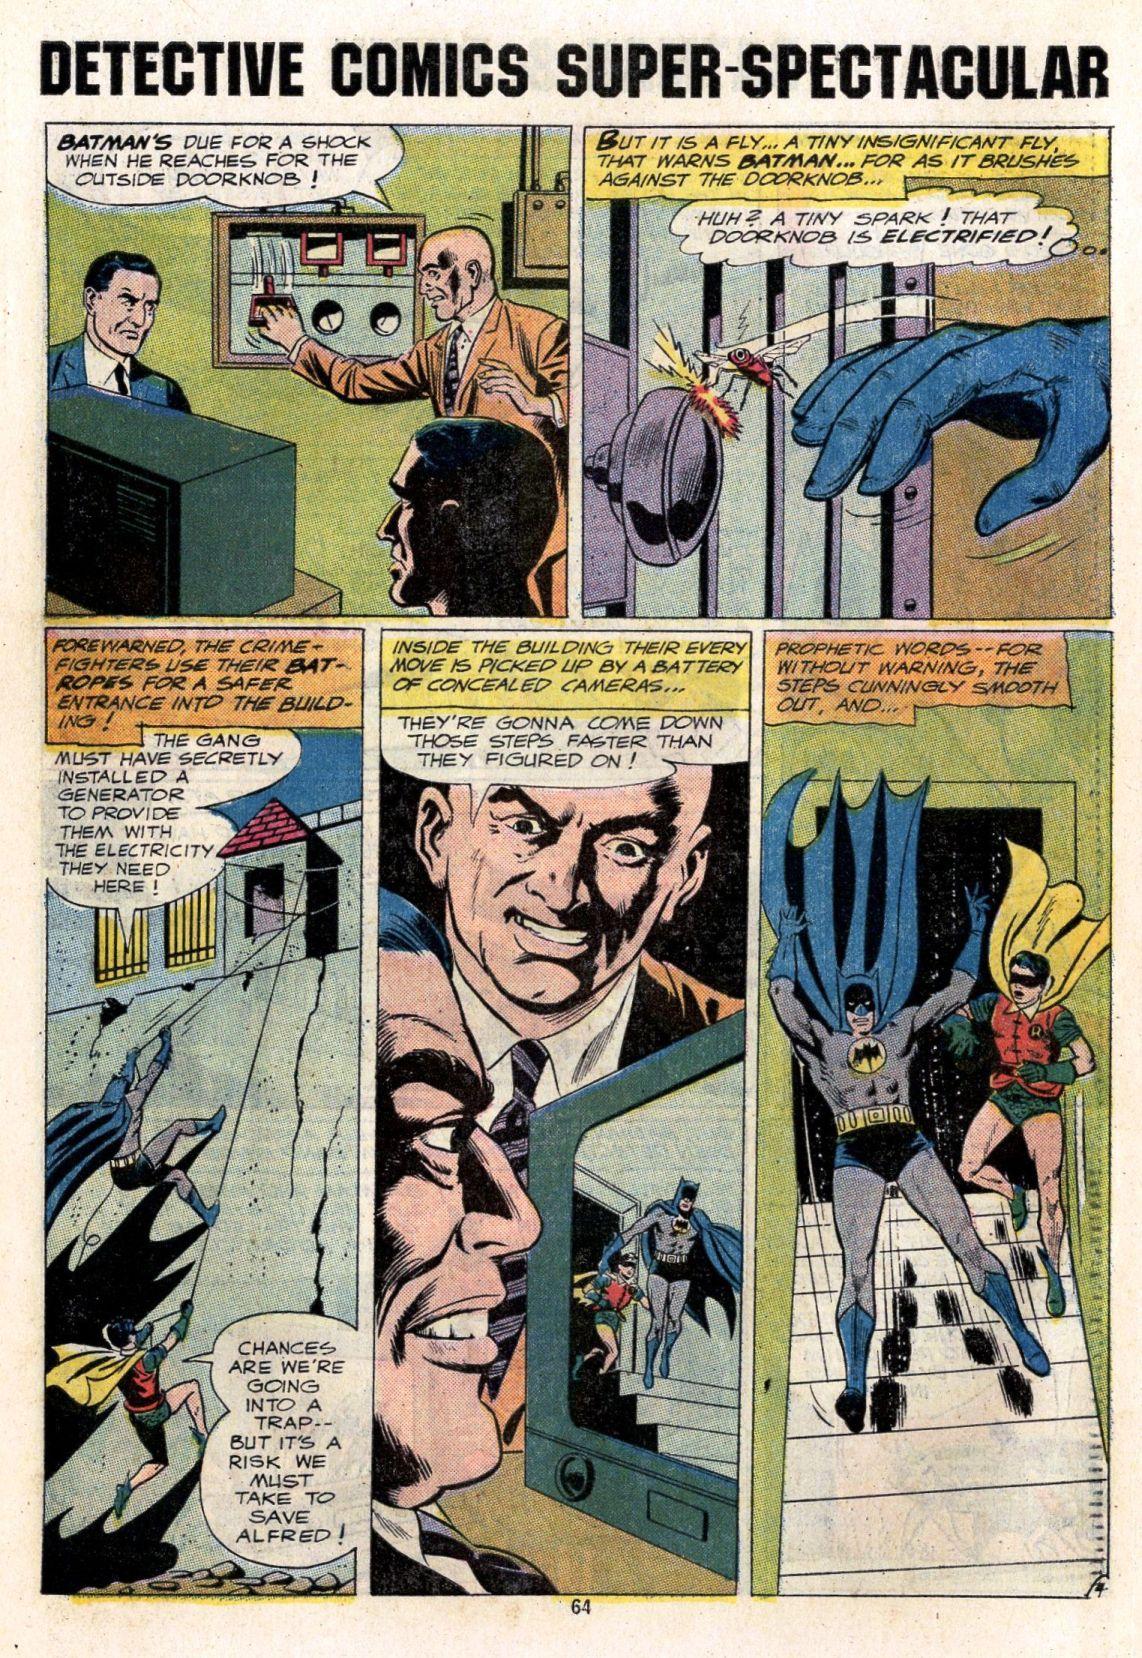 Detective Comics 1937 Issue 438 | Viewcomic reading comics